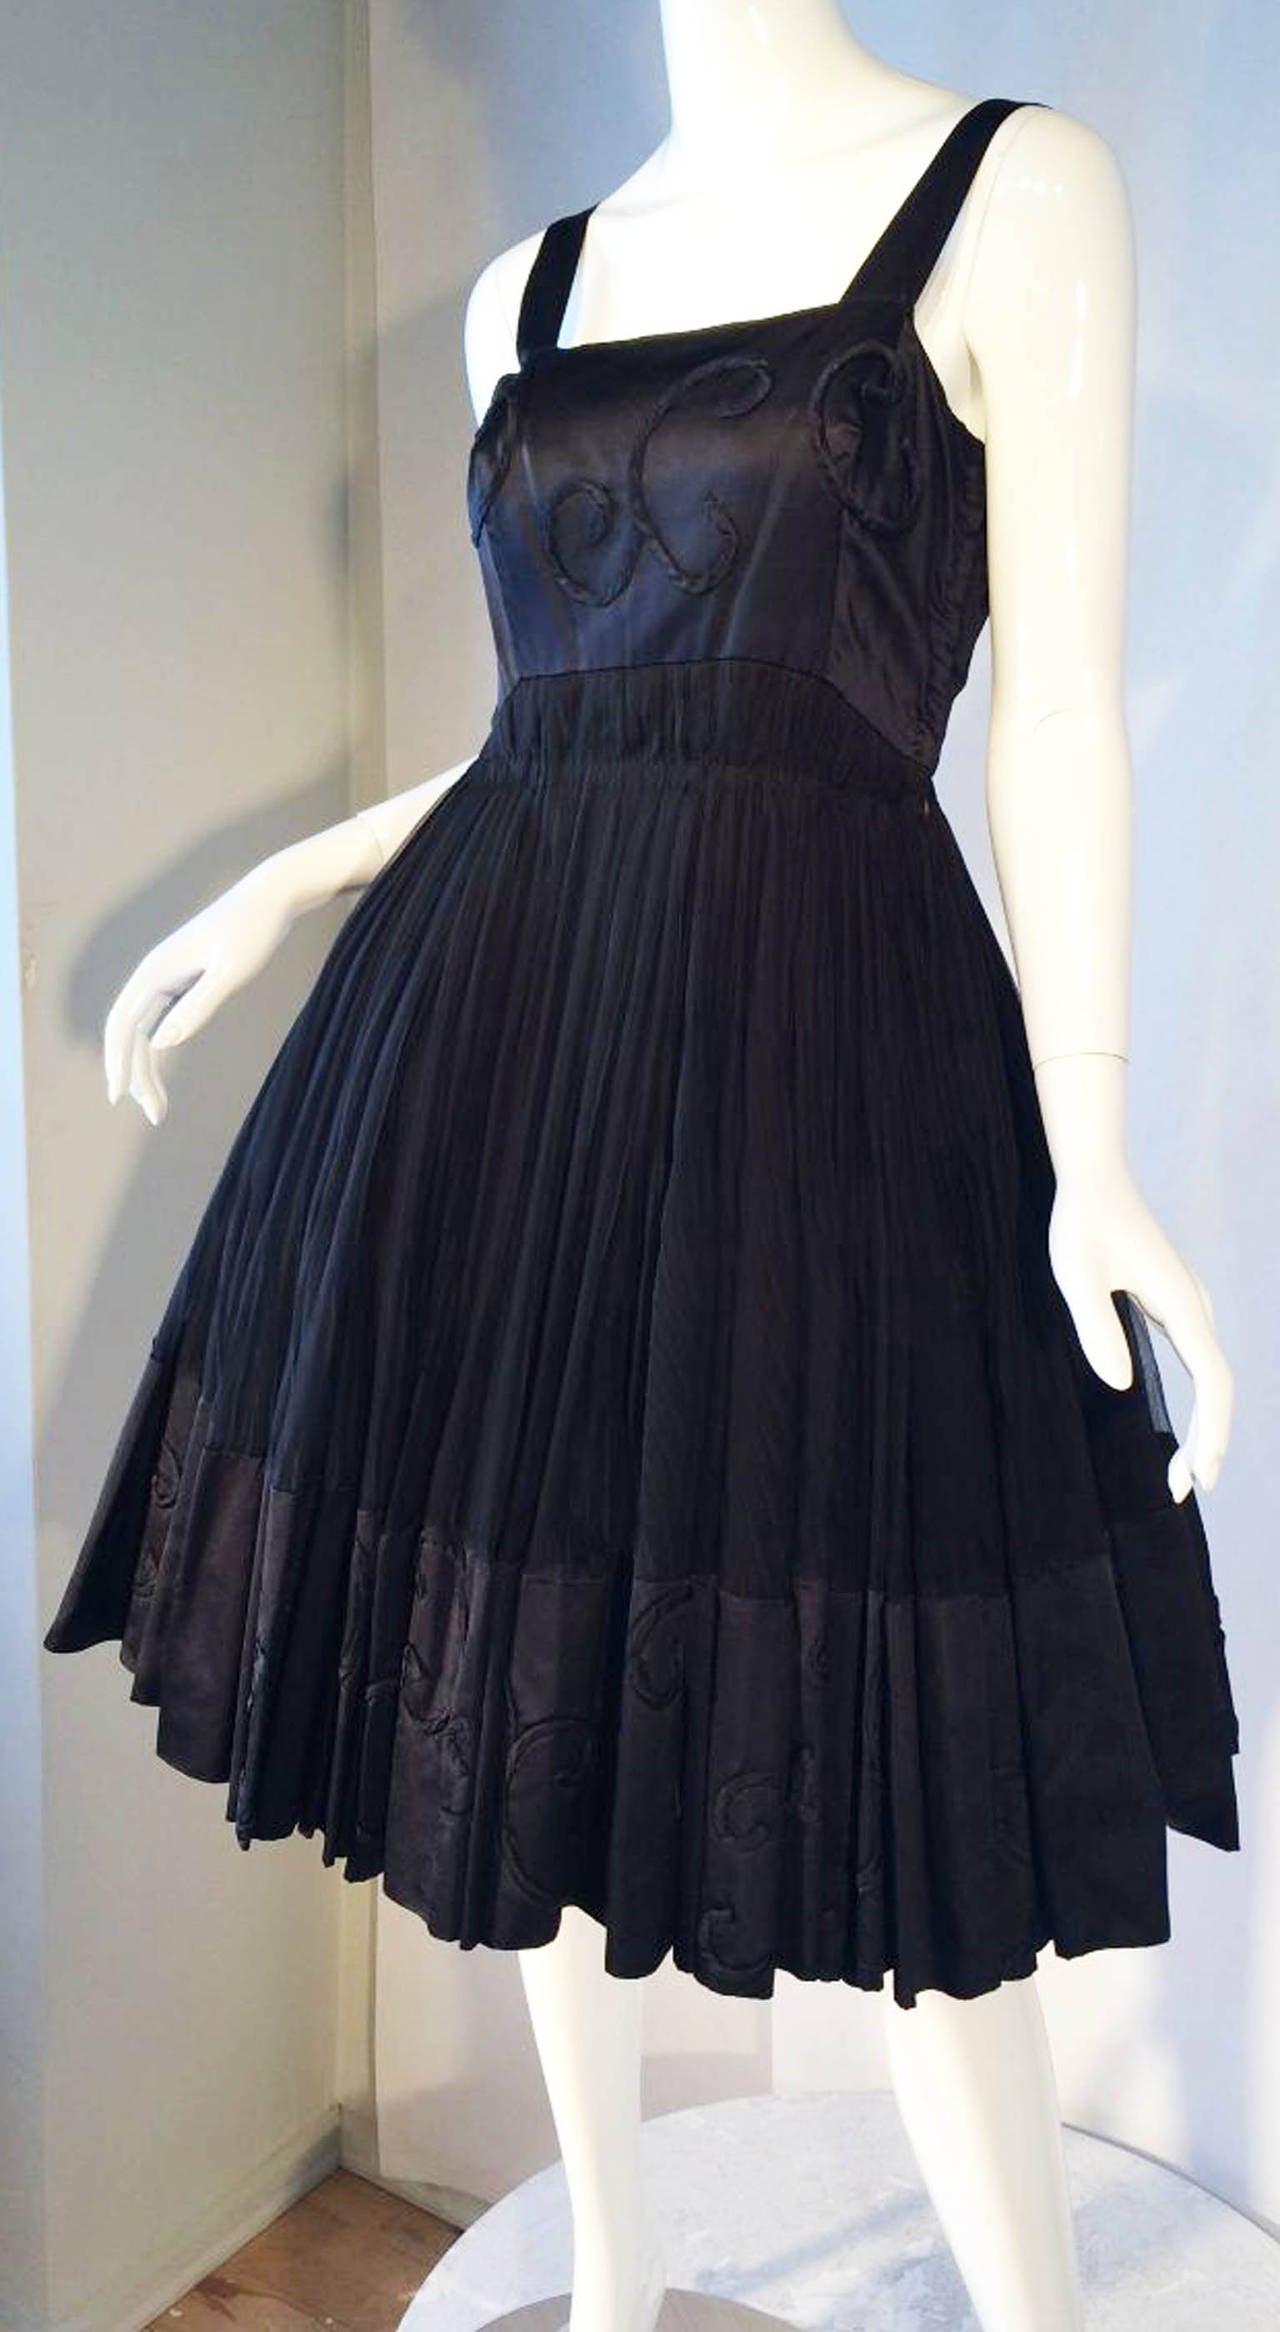 Jean patou haute couture cocktail dress for sale for Haute couture sale